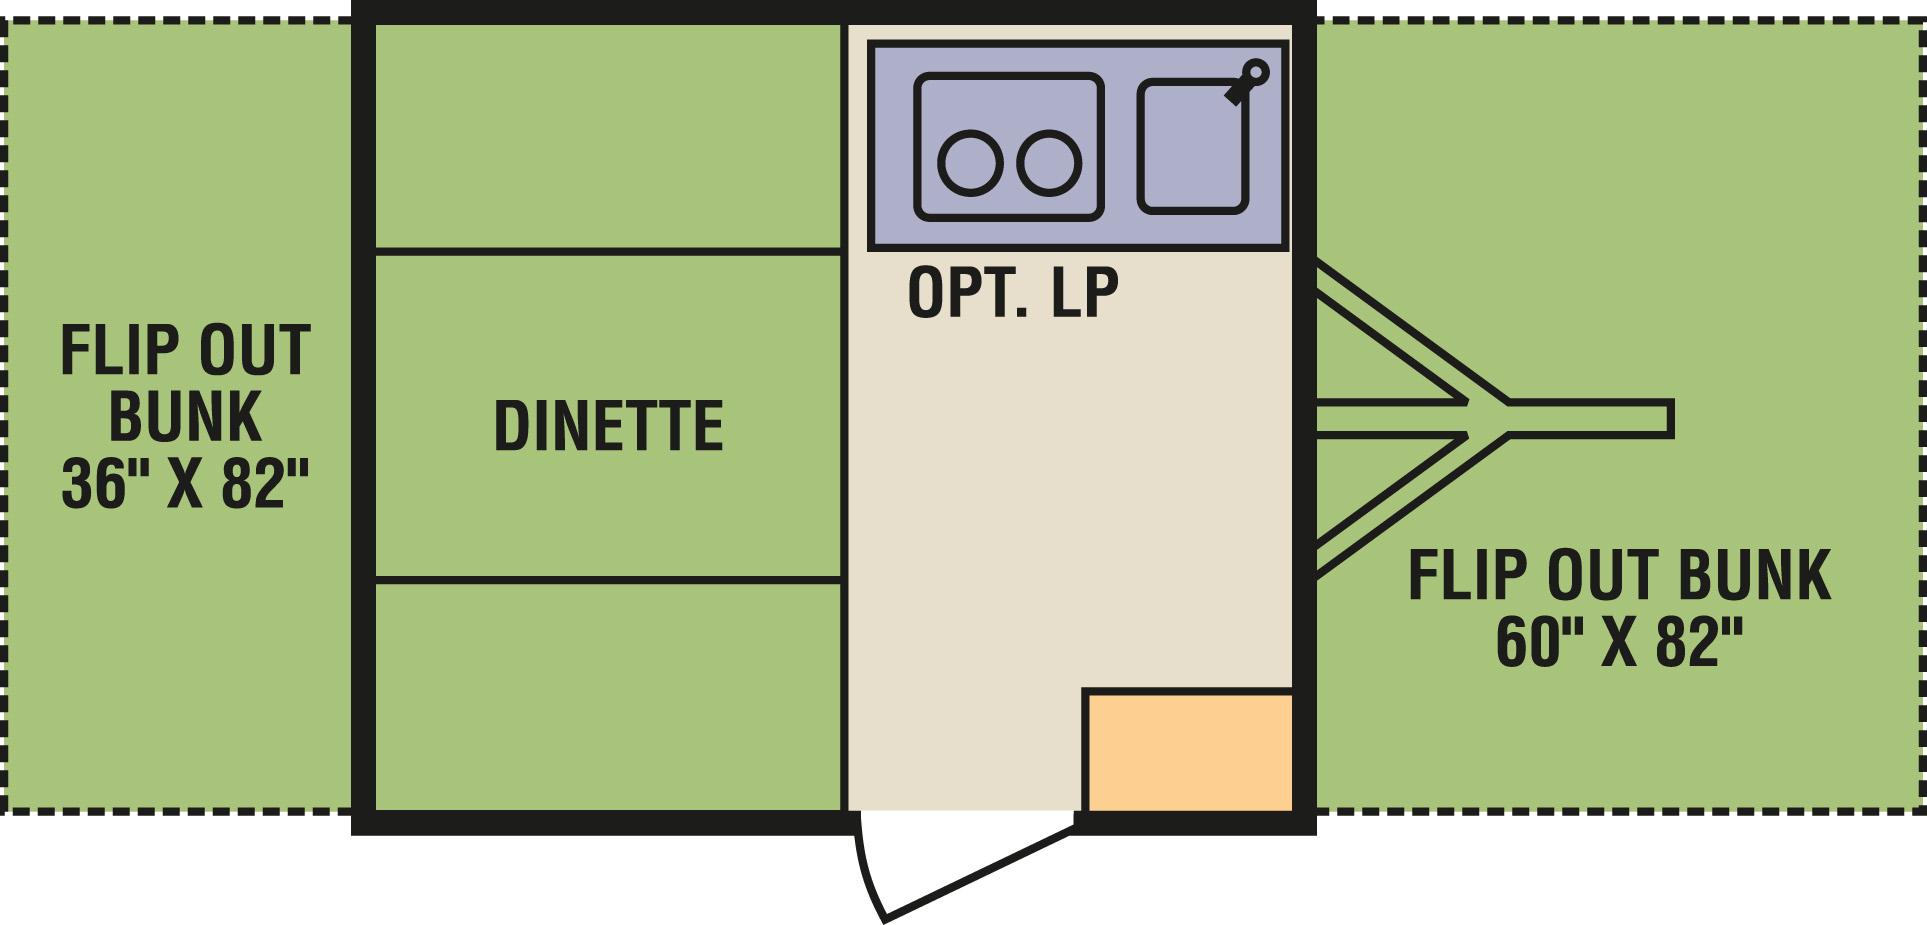 8.0999999999999996 - Floorplan